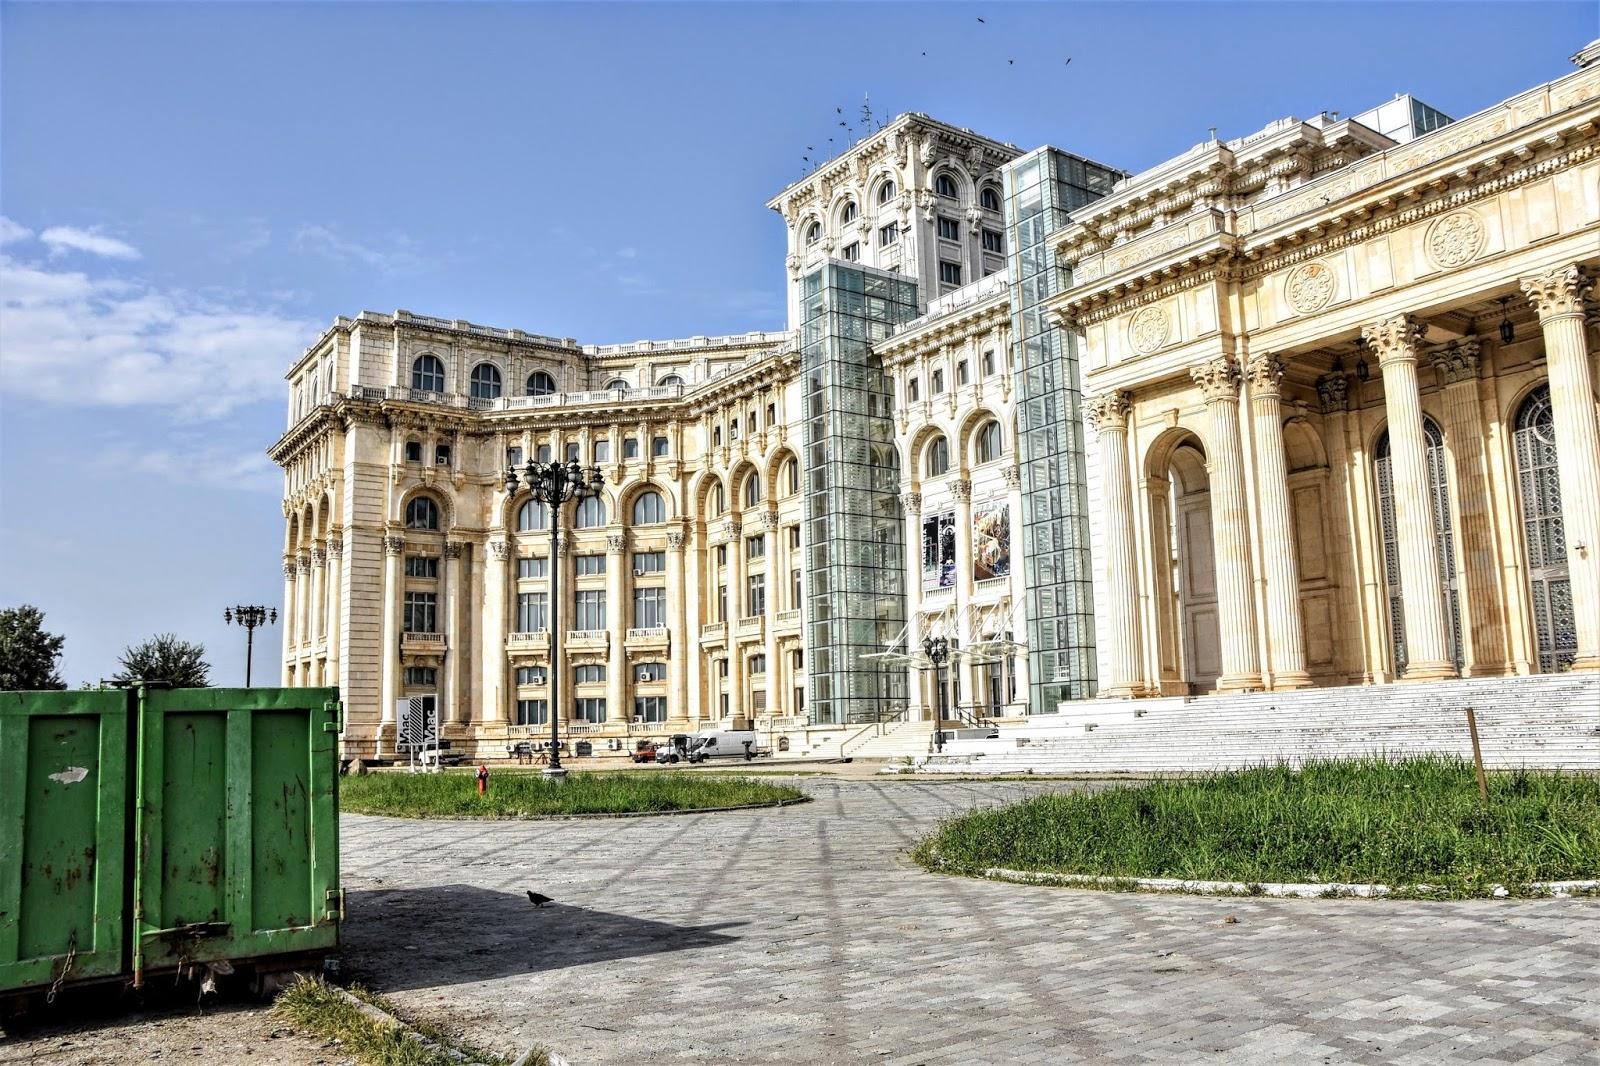 București (Bucharest, Bukareszt) | România (Romania, Rumunia)